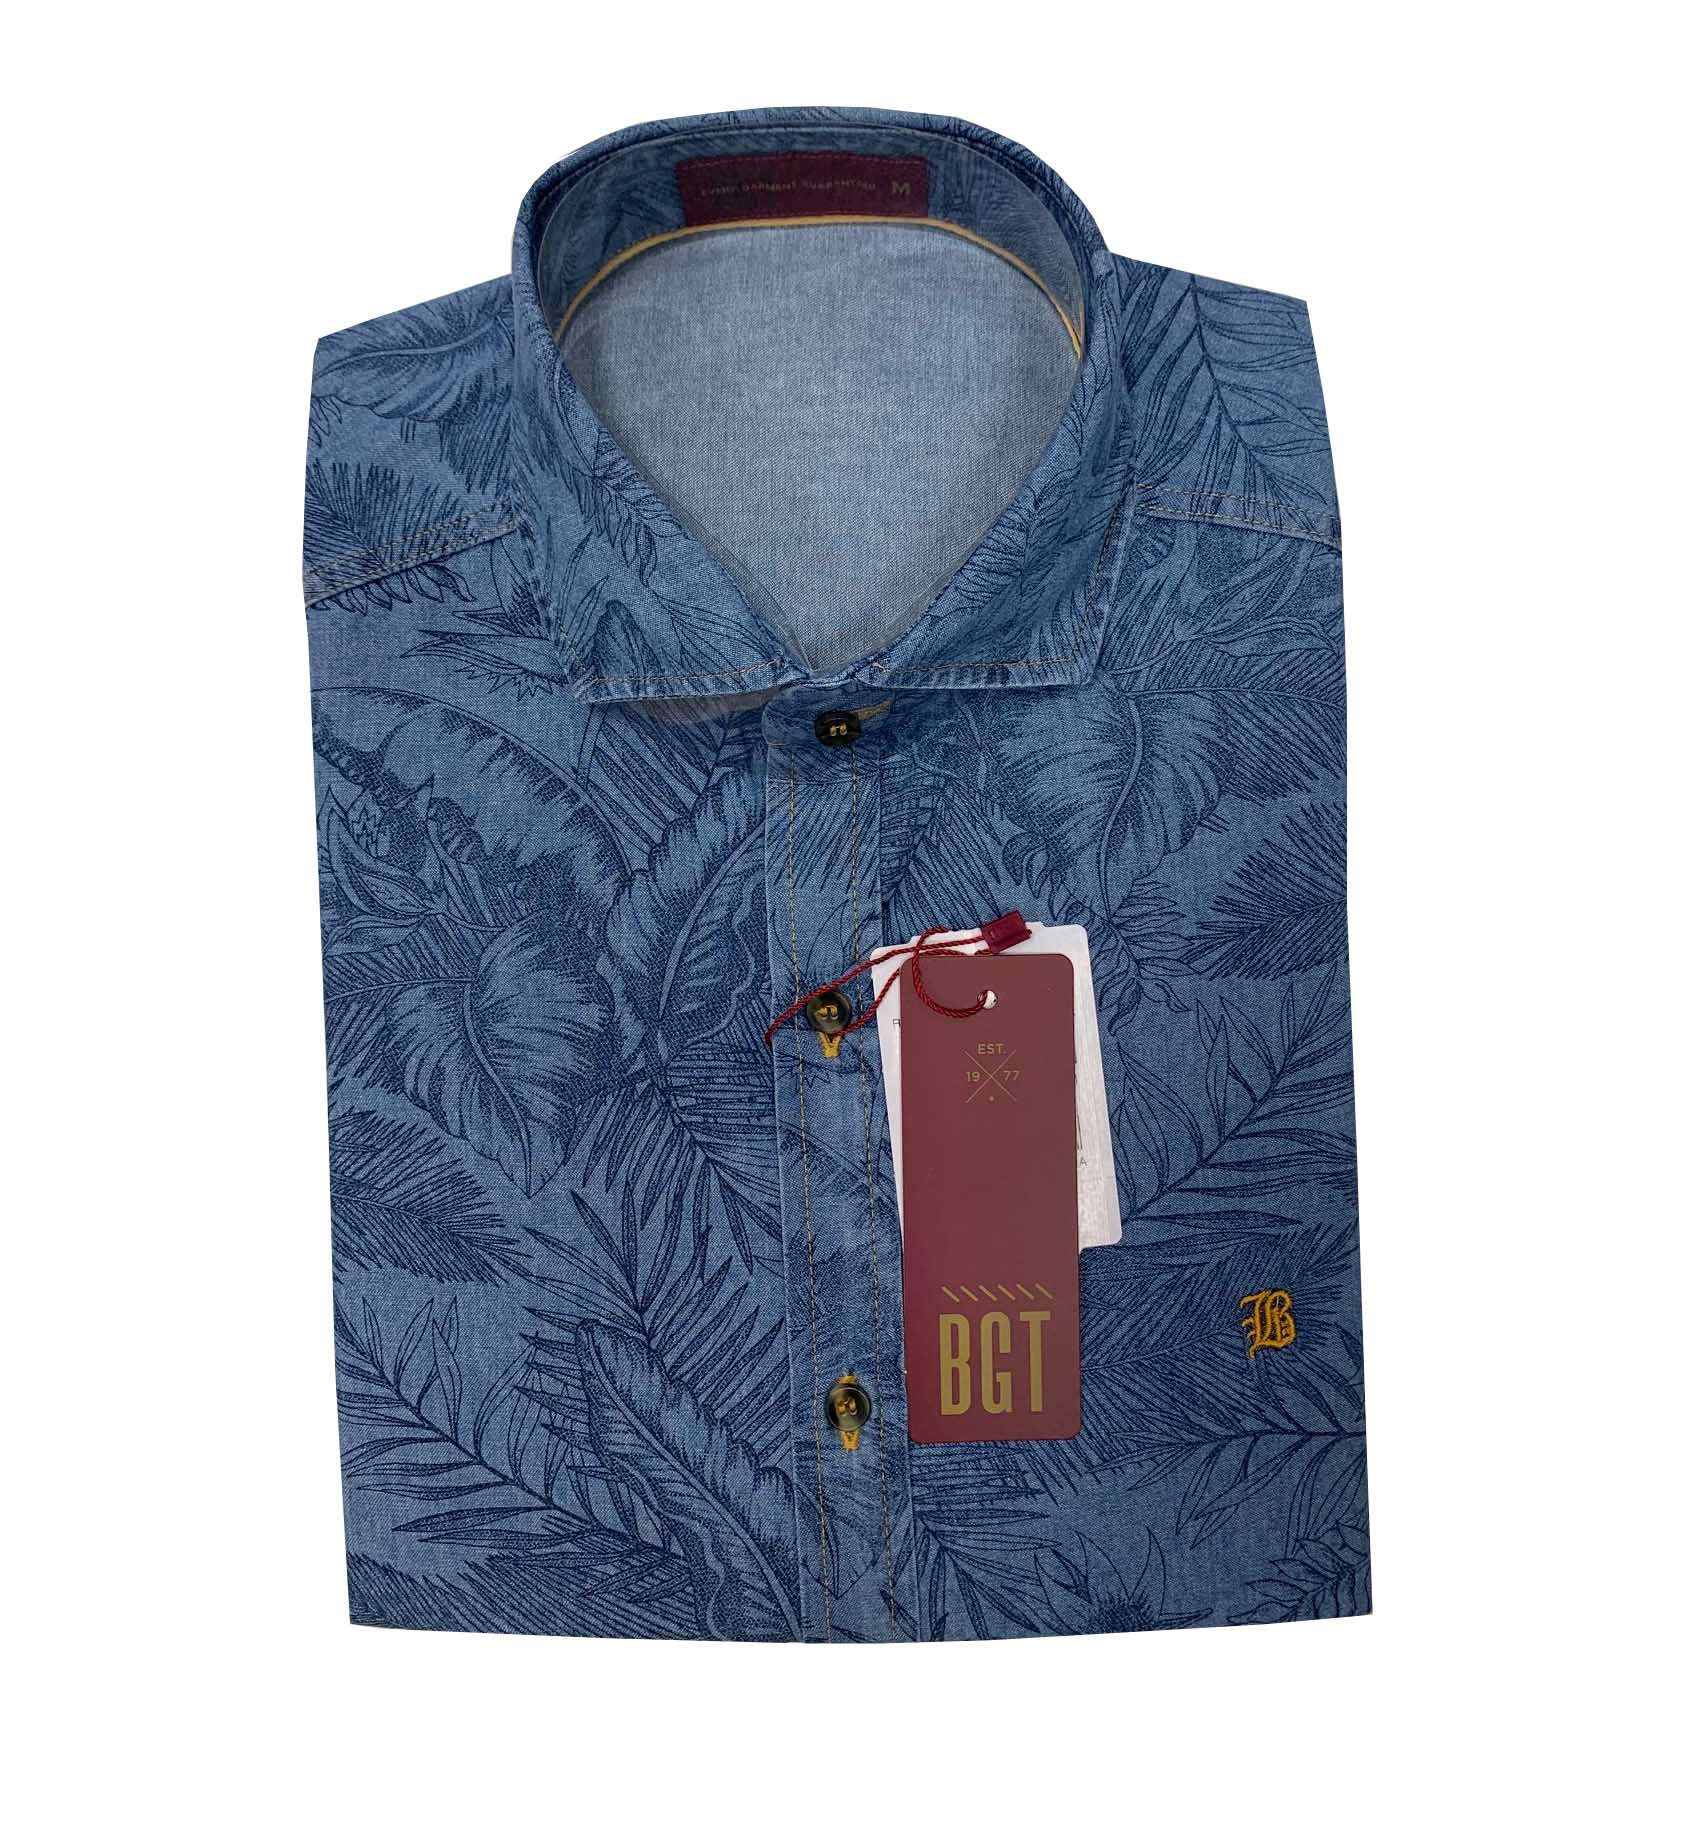 Camisa Baumgarten Manga Curta Jeans 4768 Masculina